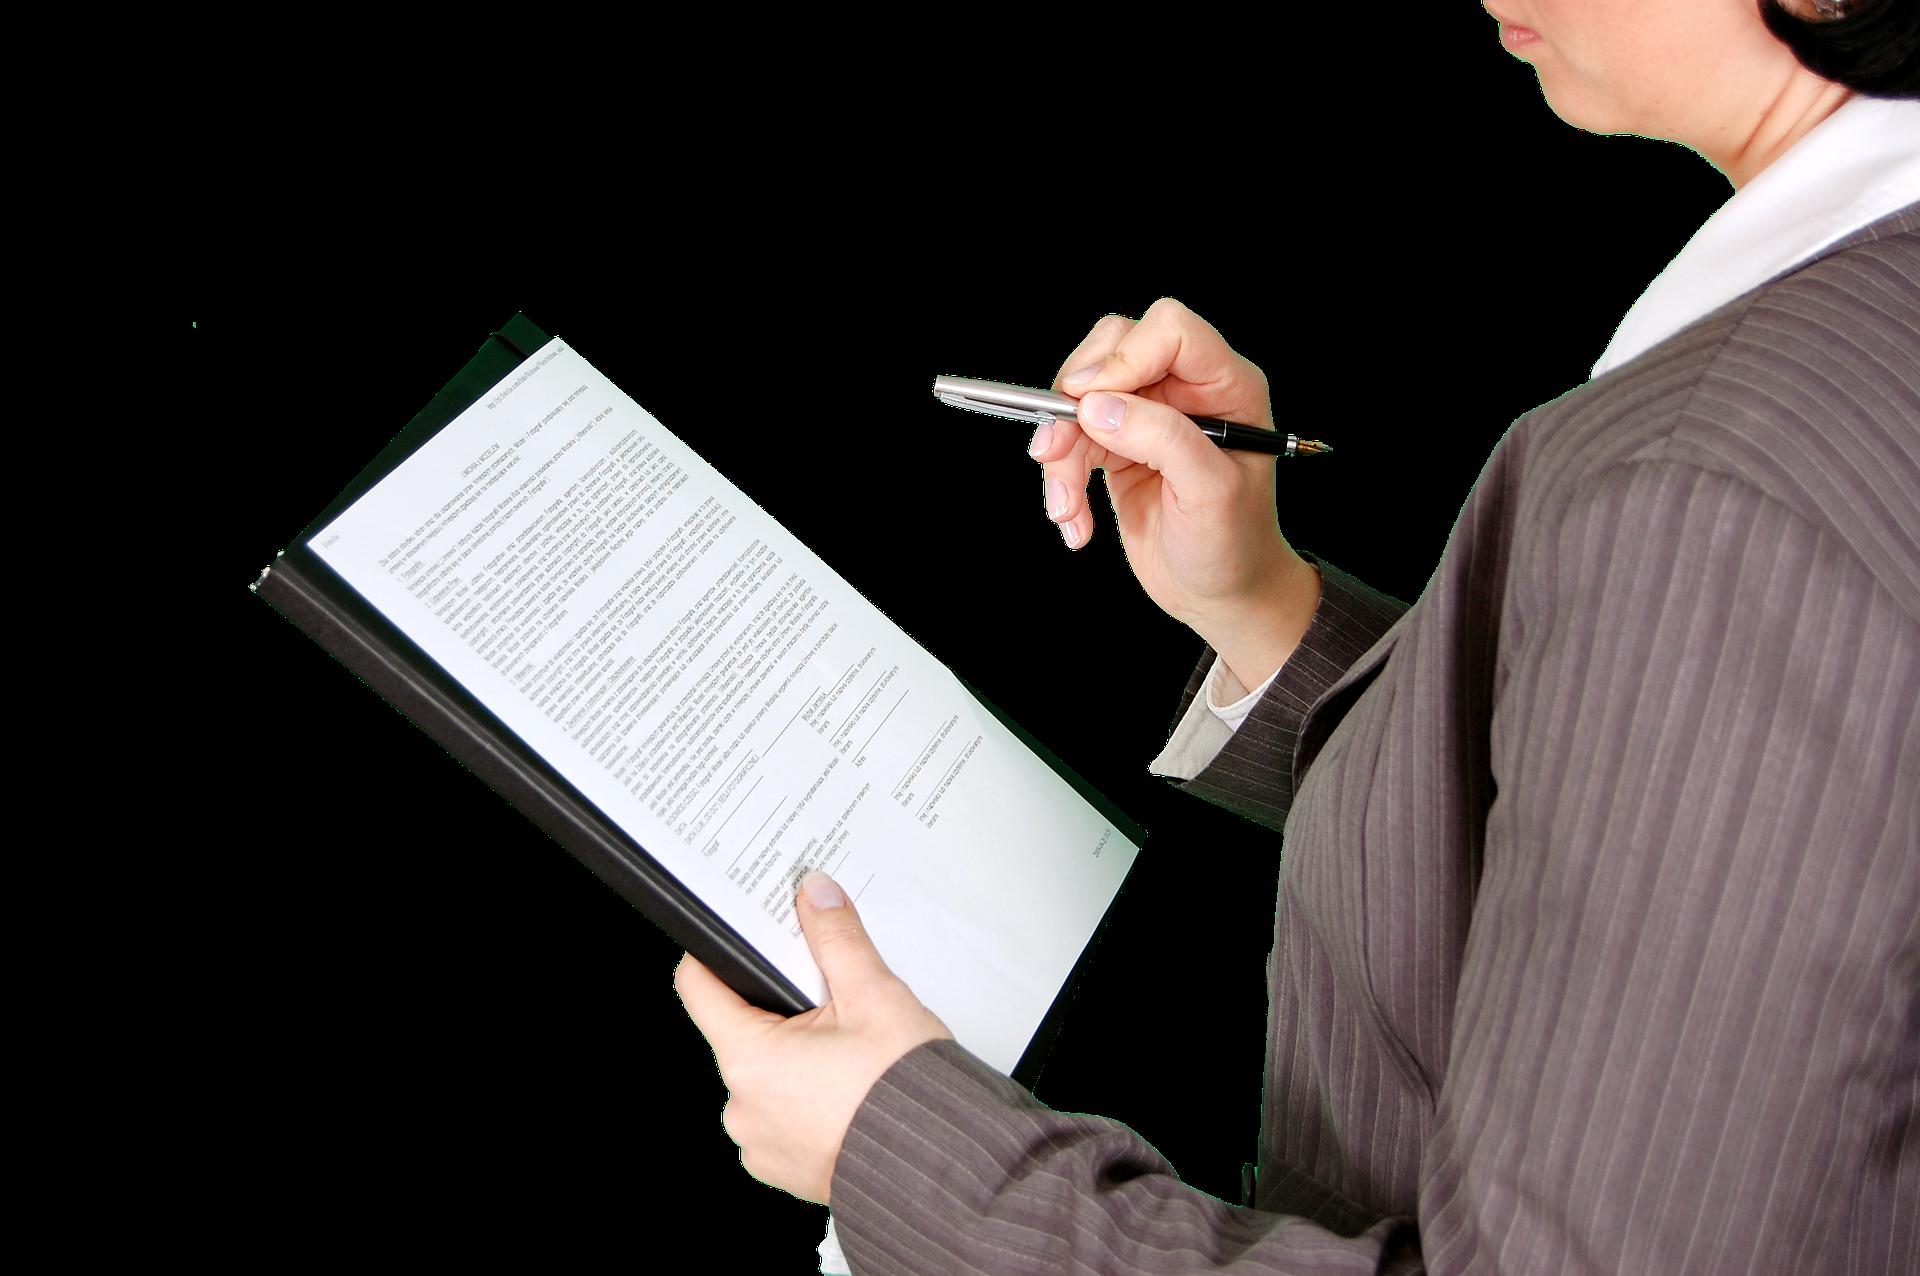 KNB wil strengere controle bij notarissen na fraudezaak Pels Rijcken - Mr. online